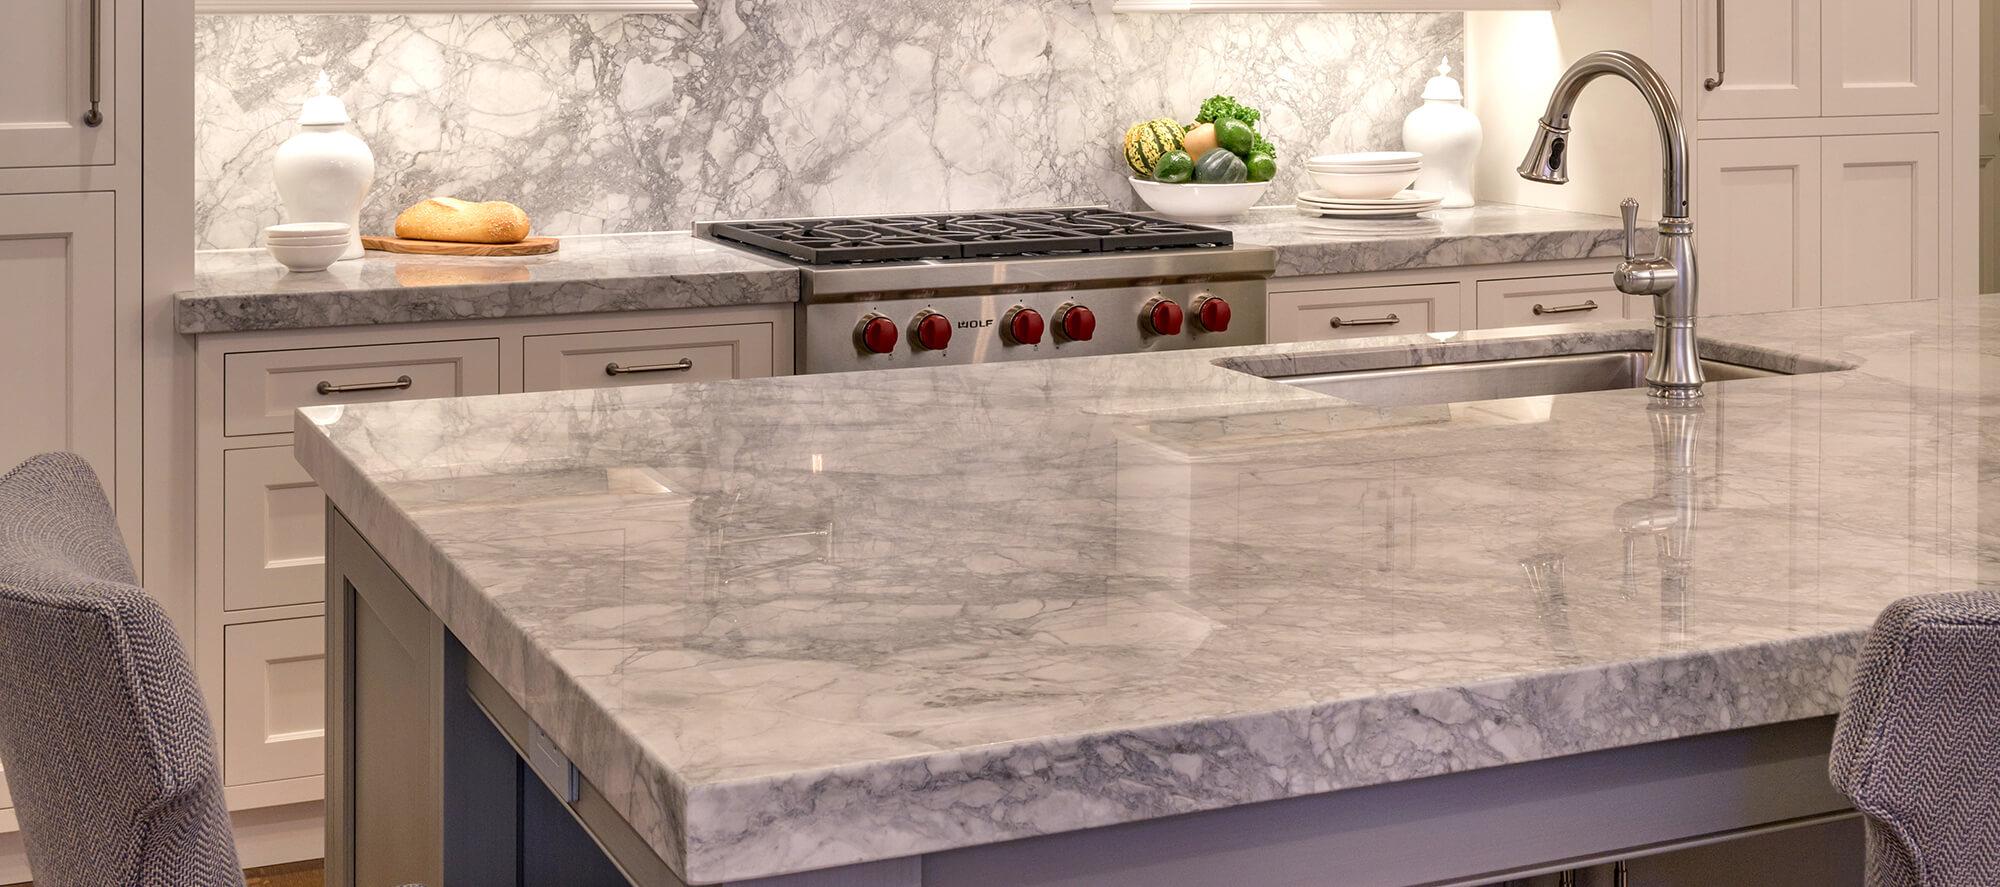 Imagine - Boston Granite Exchange, MA Stone Wholesaler